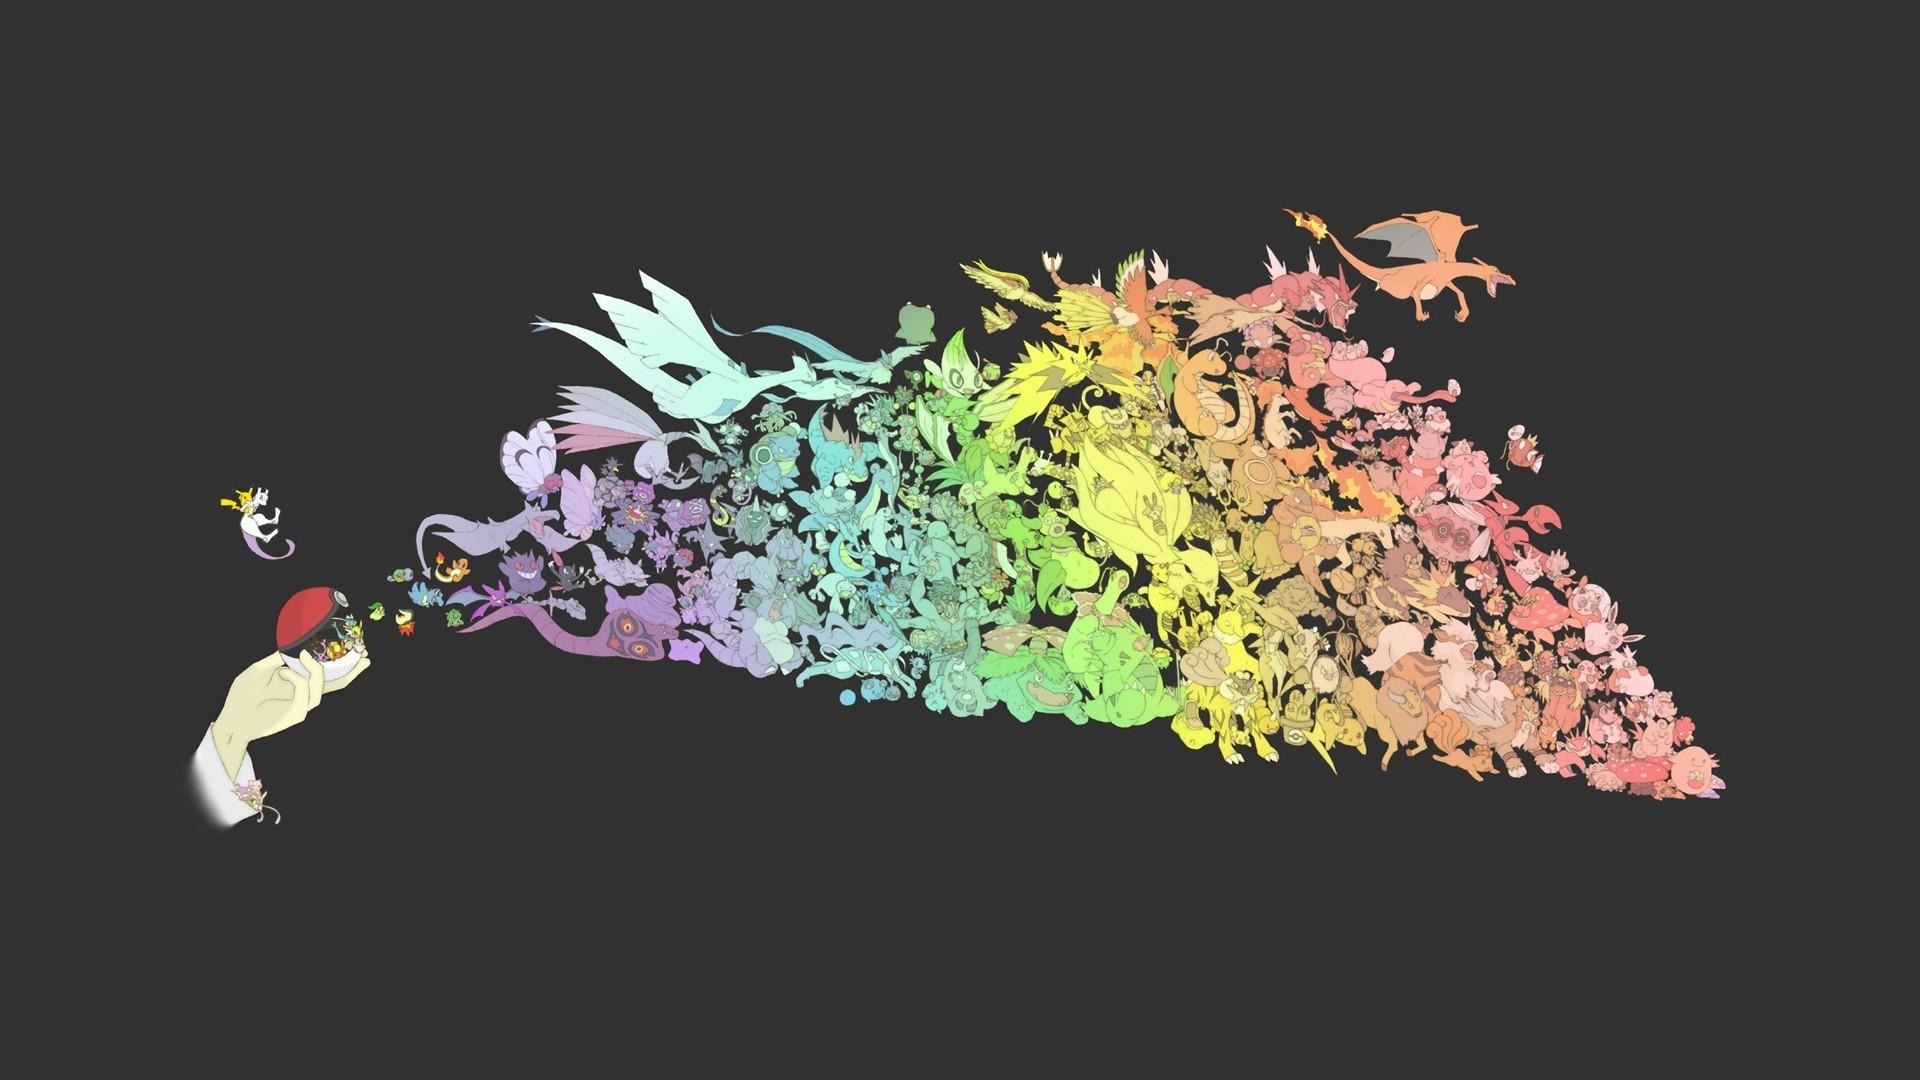 Pokemon HD Wallpapers p 1600×900 Wallpaper Pokemon (43 Wallpapers) |  Adorable Wallpapers